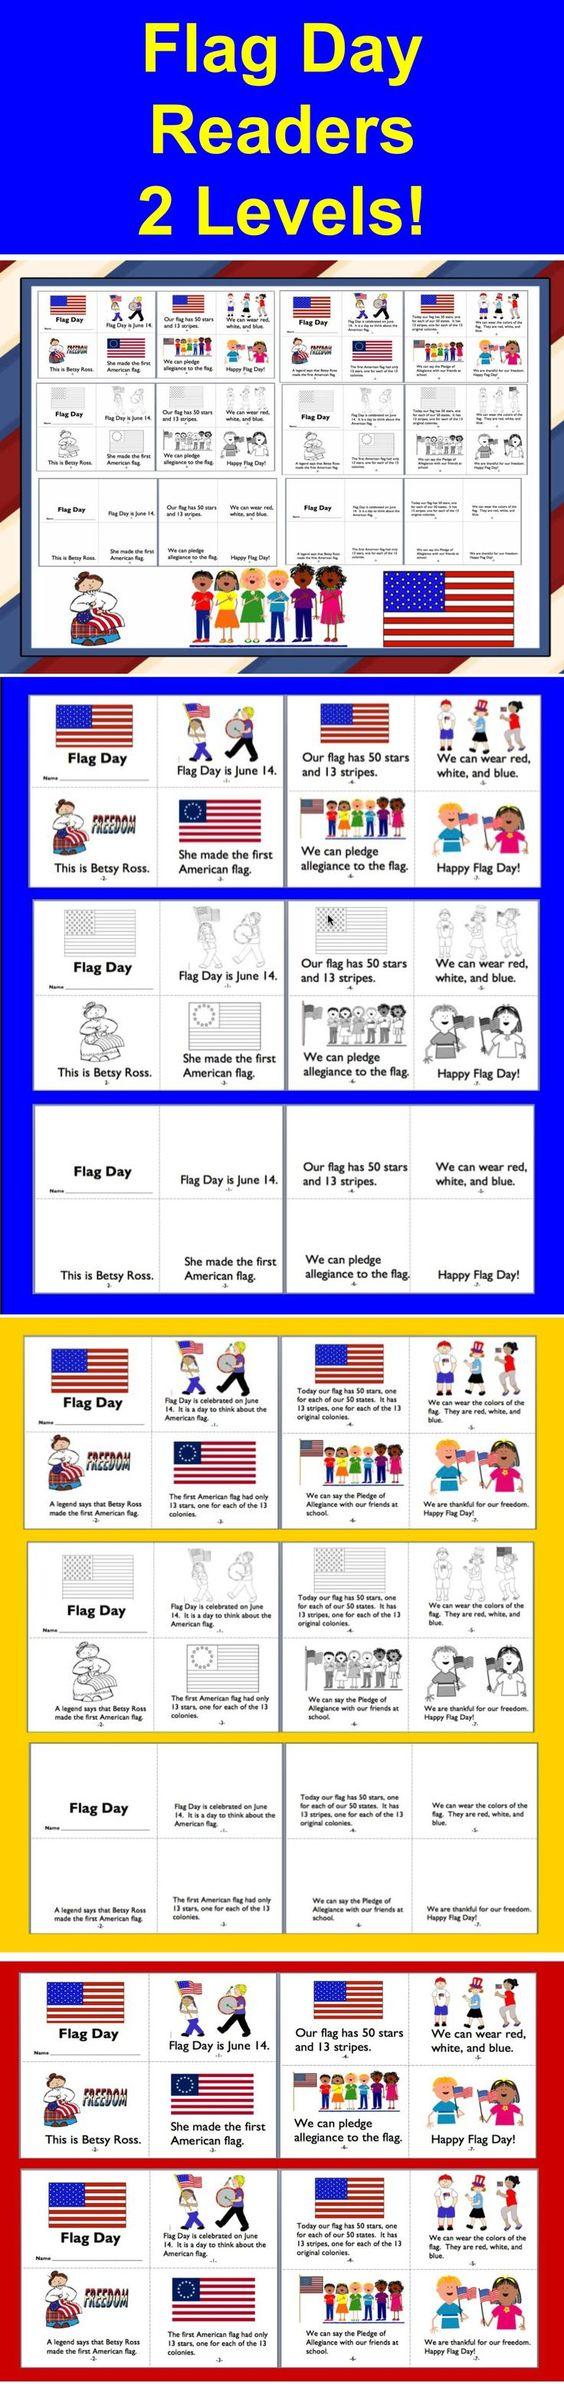 Worksheet Reading Level K flag day readers 2 reading levels 3 versions each level k1 easy assembly of 1 full color illustrations black